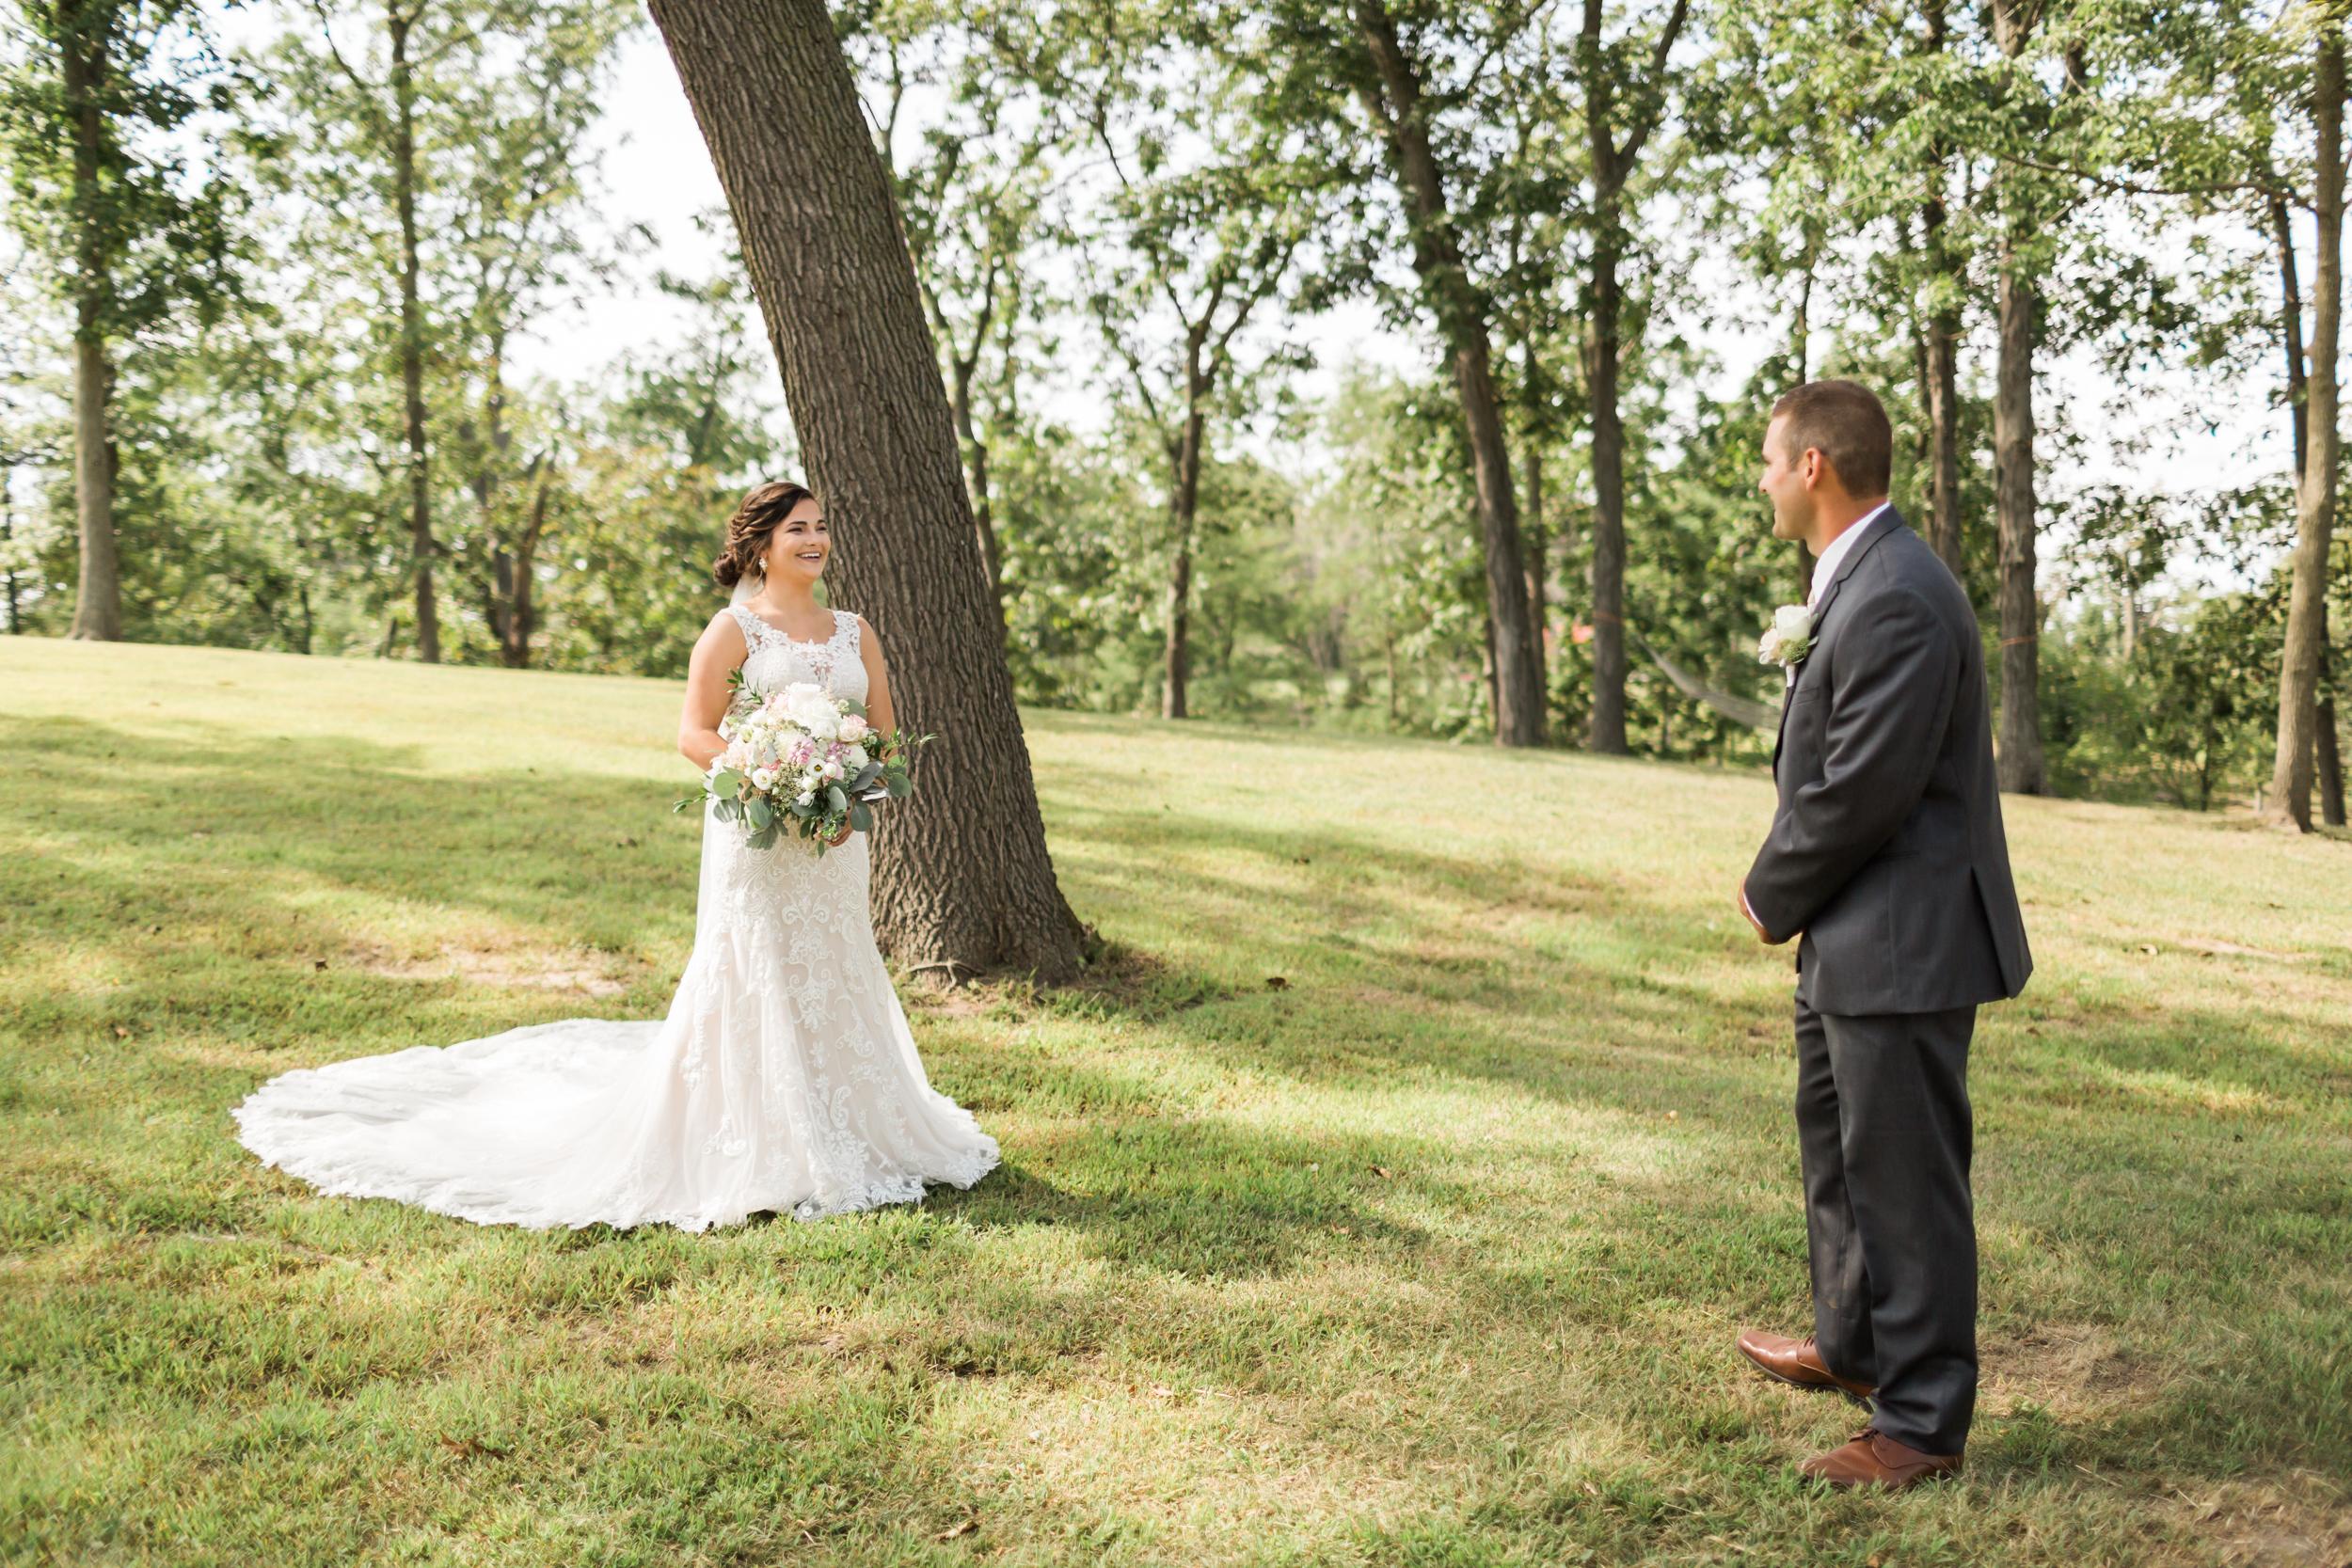 romanticcountrywedding--35.jpg